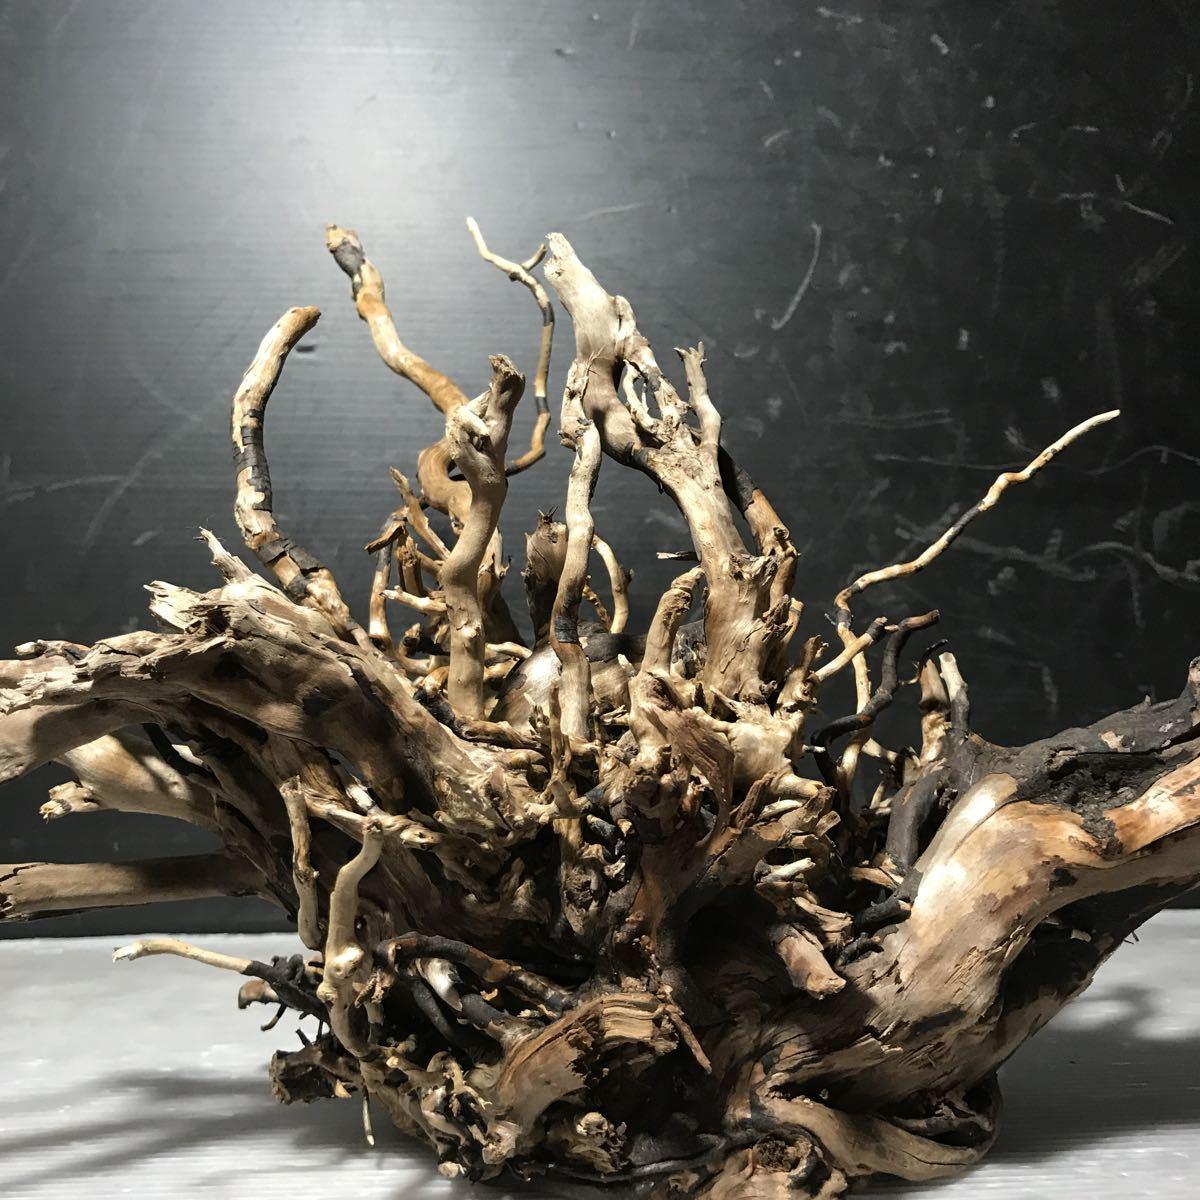 ☆sea tree☆煮沸消毒済み流木 ブランチ流木/水槽/アクアリウム/テラリウム/インテリア/ADA/サンゴ/置物_画像6